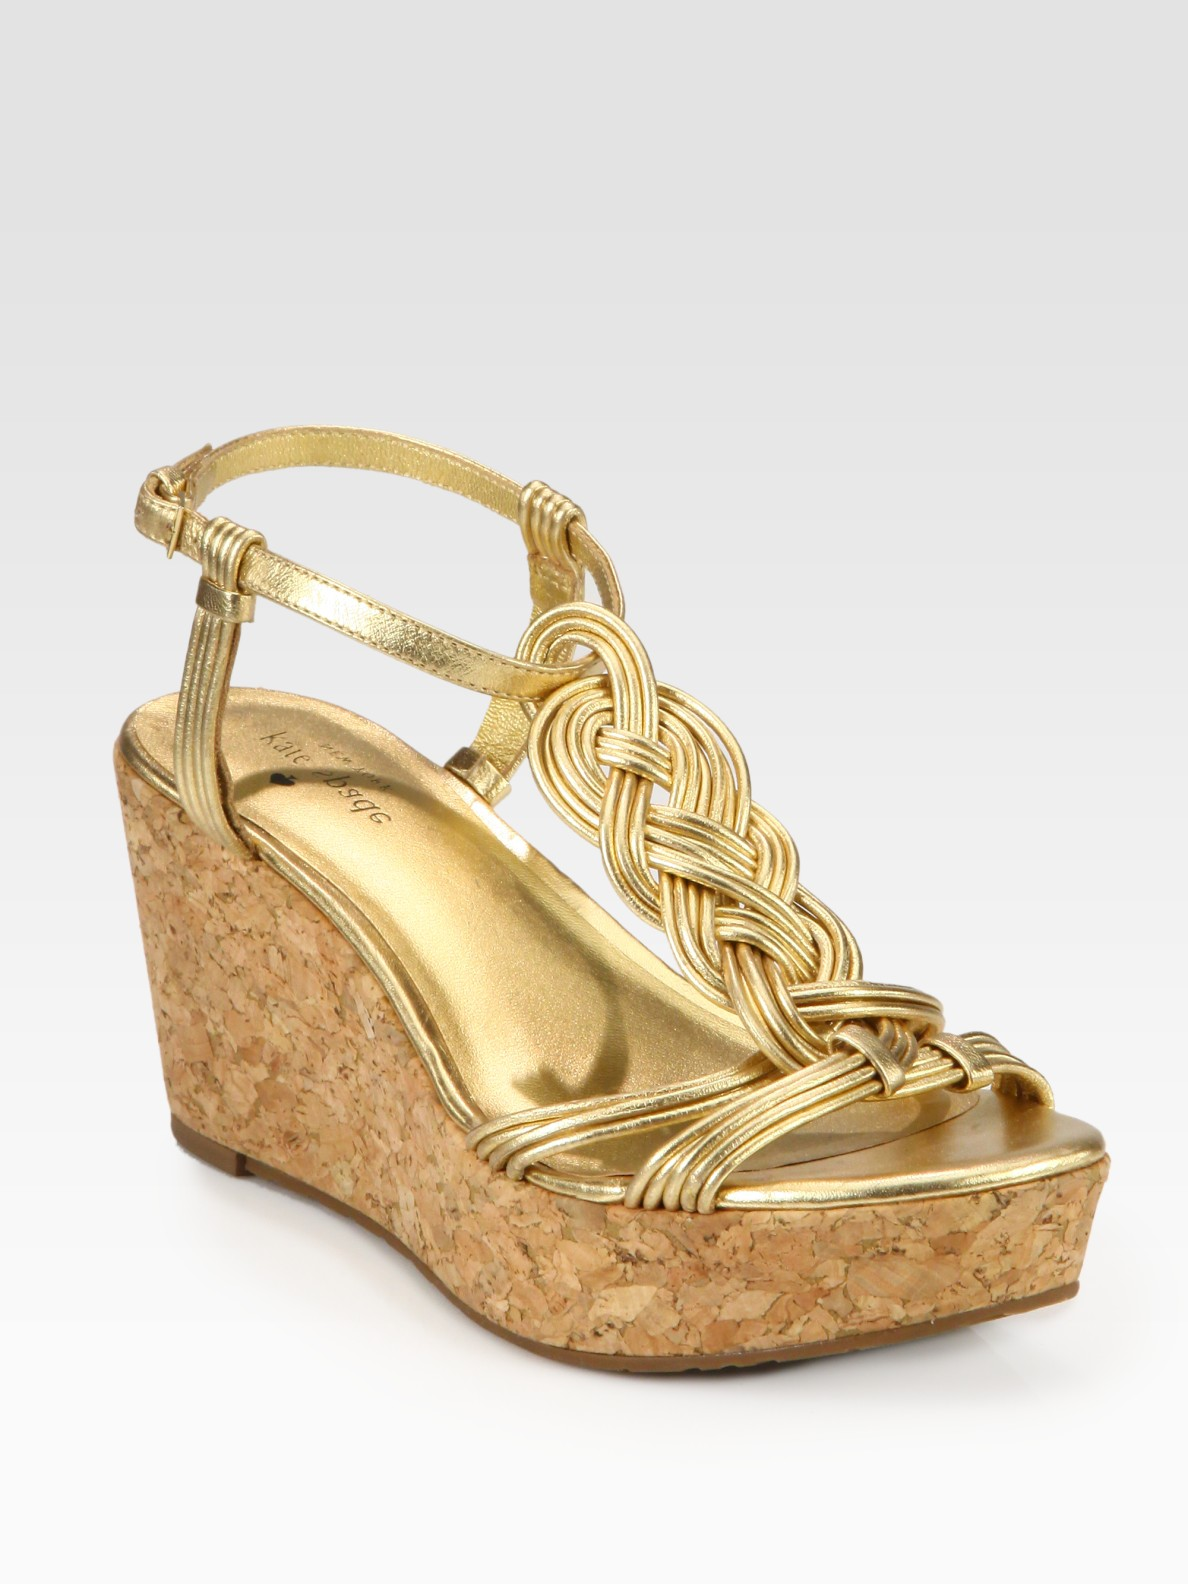 Delta Kate Kitchen Faucet Kate Spade Gold Sandals 28 Images Kate Spade Imagine